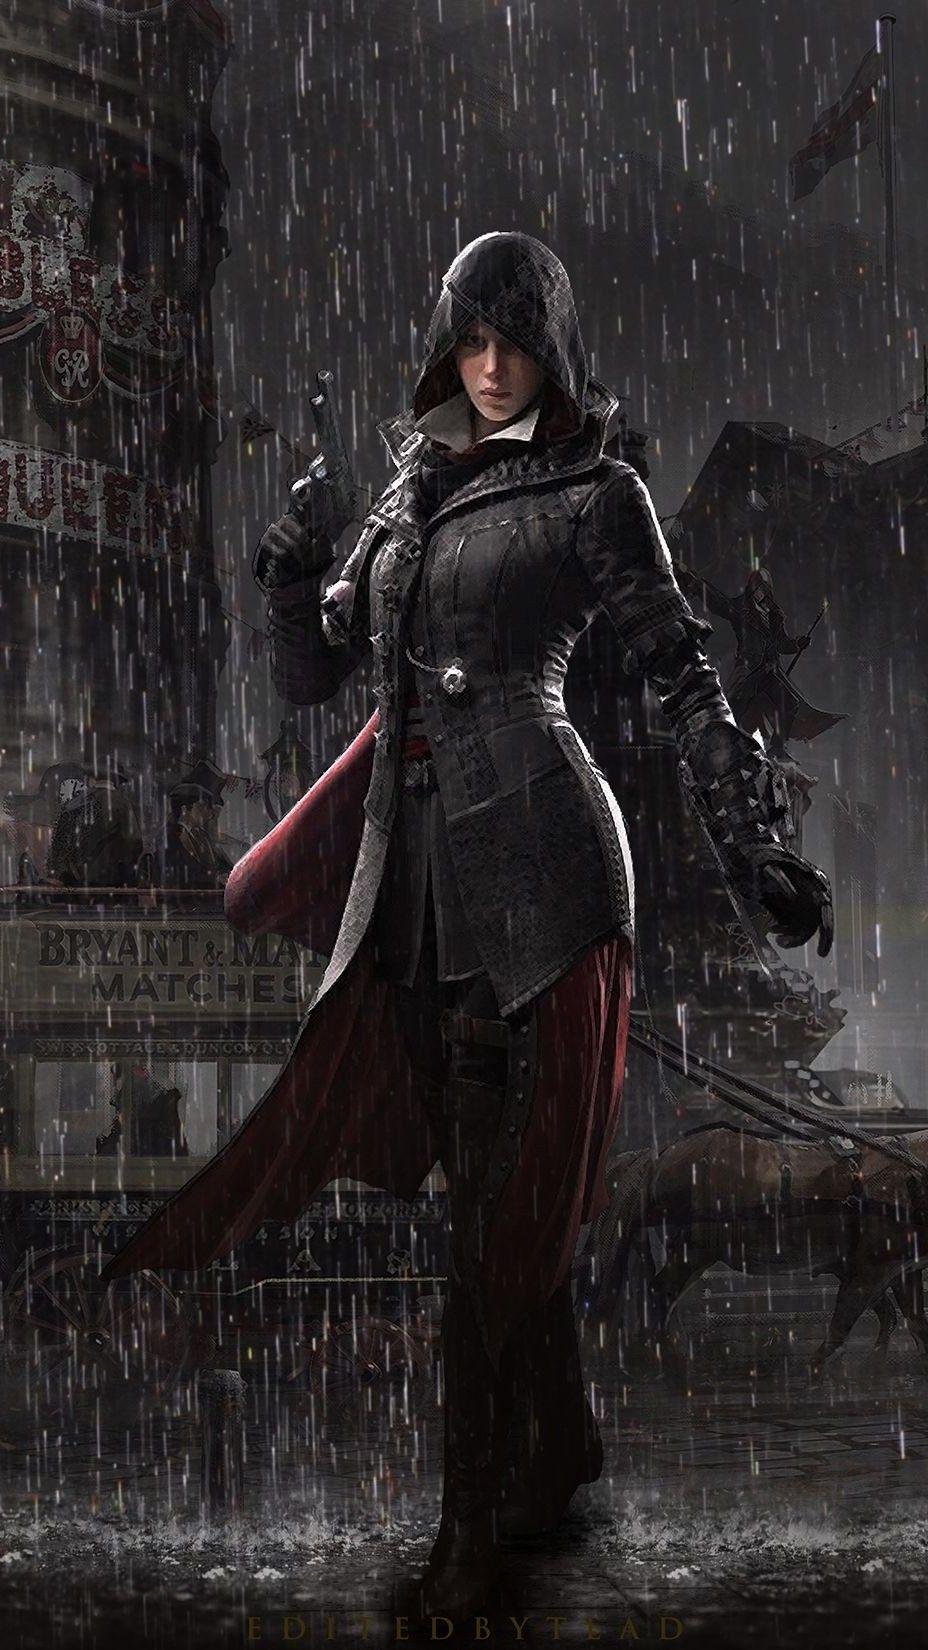 Wallpaper Wallz Gaming Wallpapers Assassins Creed Syndicate